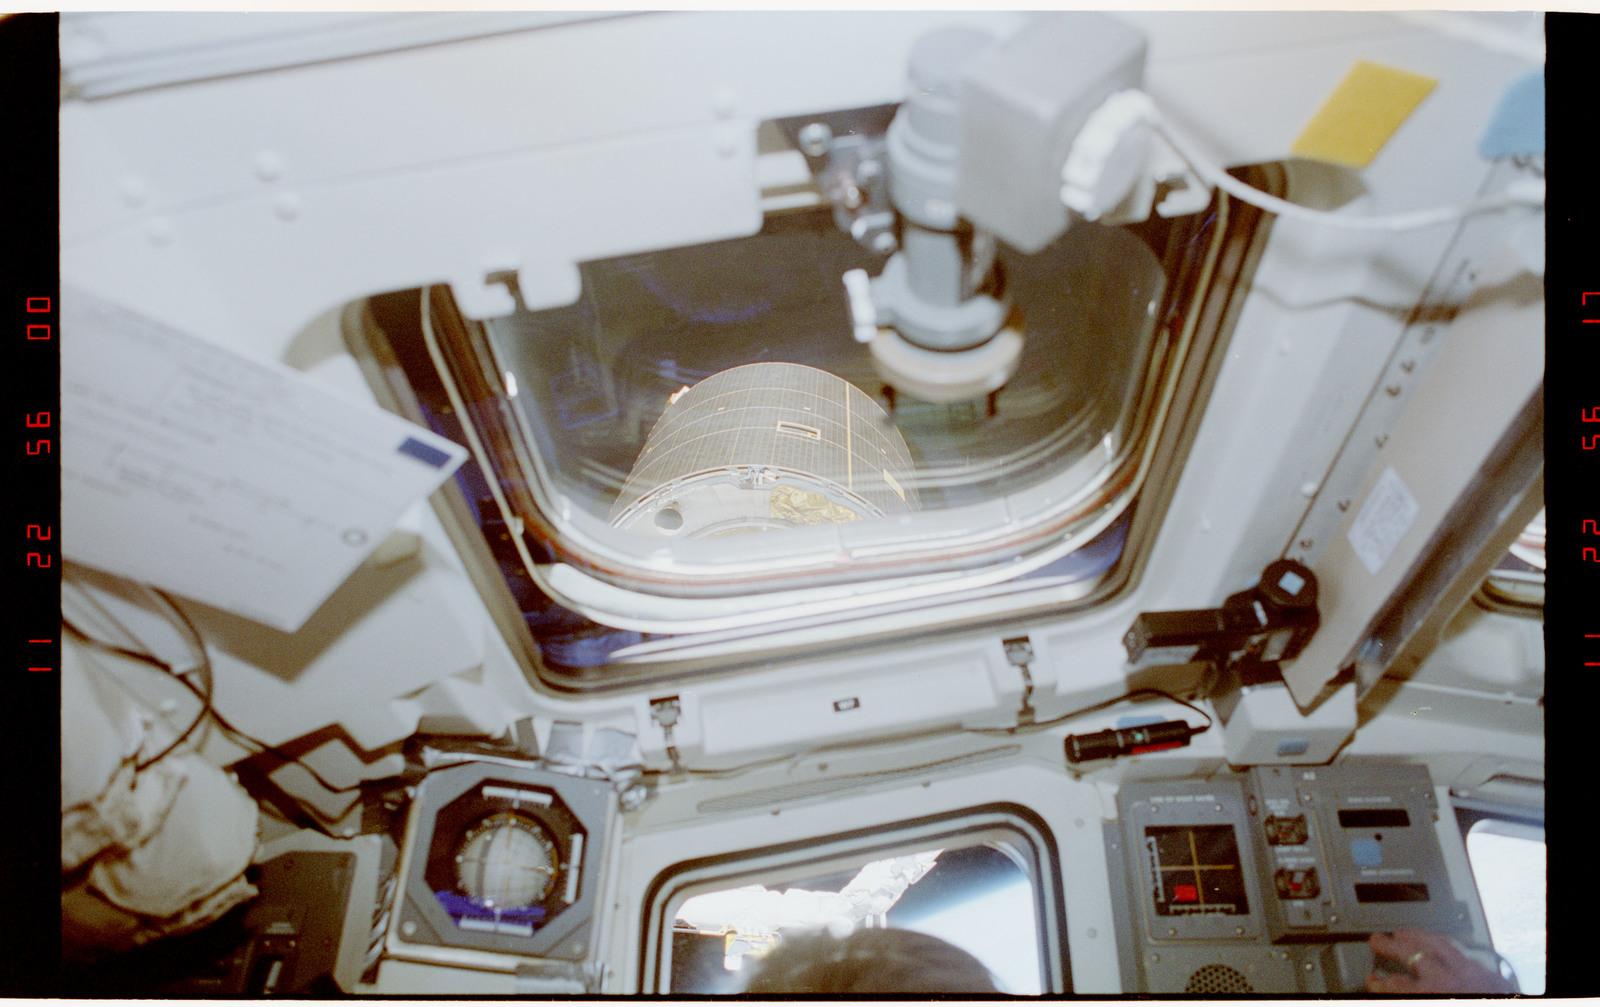 S49-37-032 - STS-049 - Scenes of the single crewmember EVA INTELSAT capture attempt.